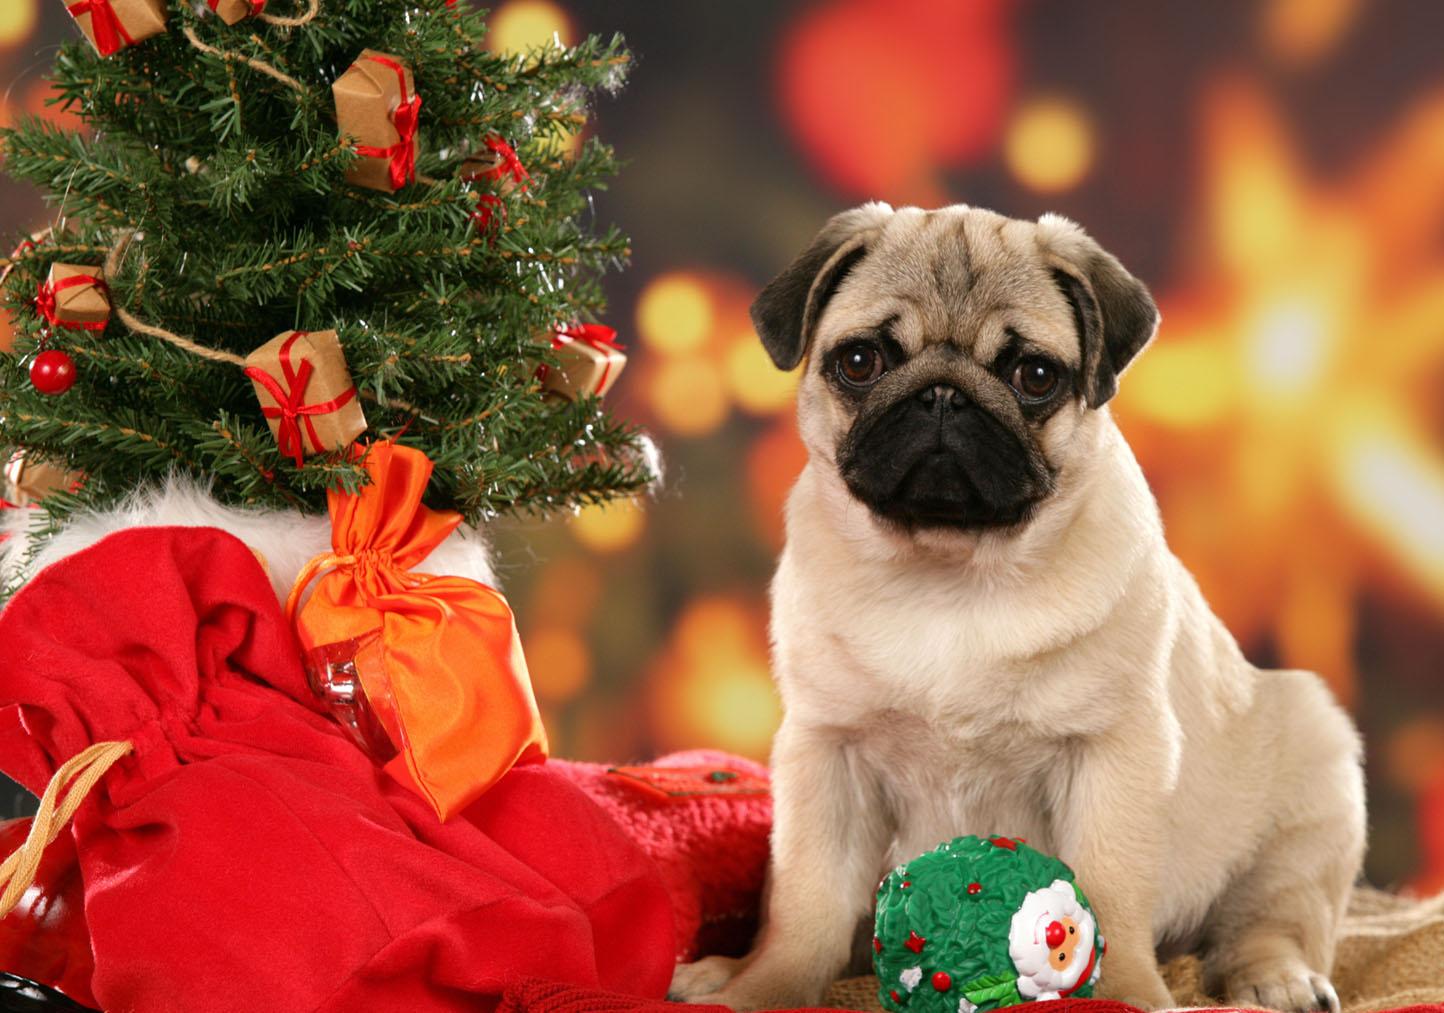 Christmas Pug Wallpaper   The Dog Wallpaper   Best The Dog Wallpaper 1444x1013